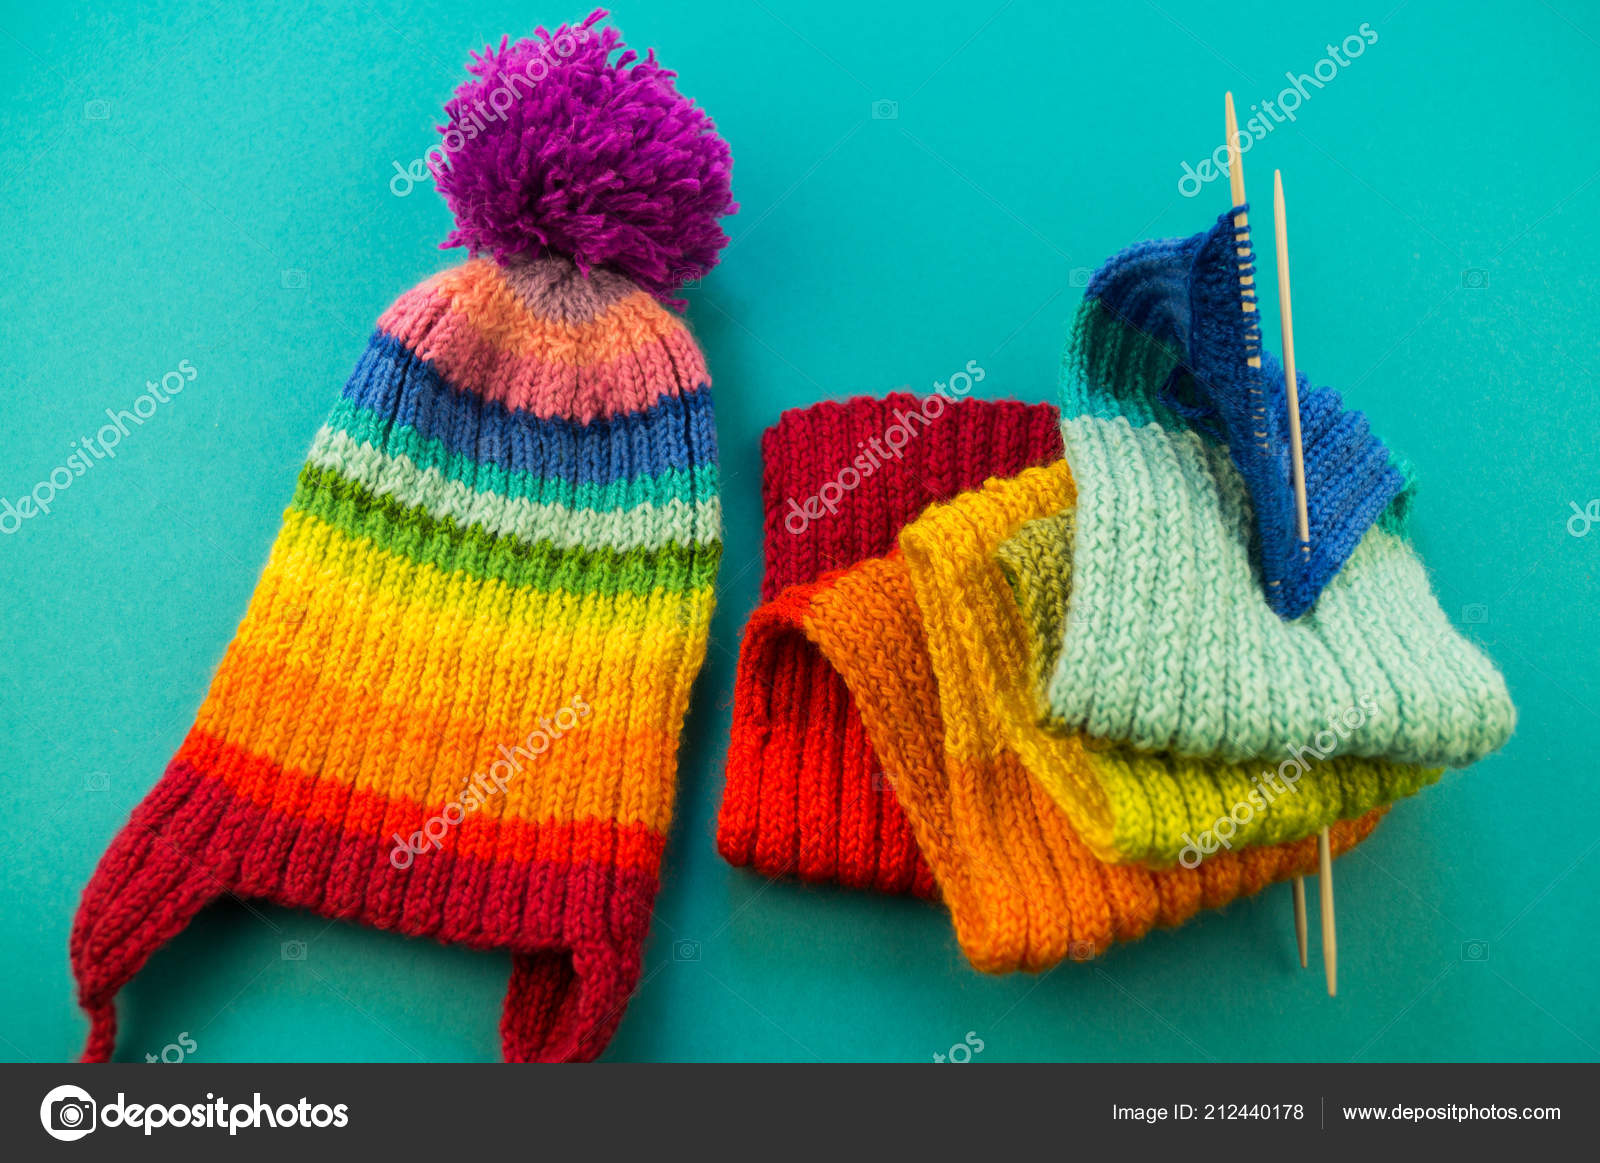 c43de7118f1d Knitting Rainbow Scarf Hat Basket Balls Wool Knitting Needles Blue — Stock  Photo